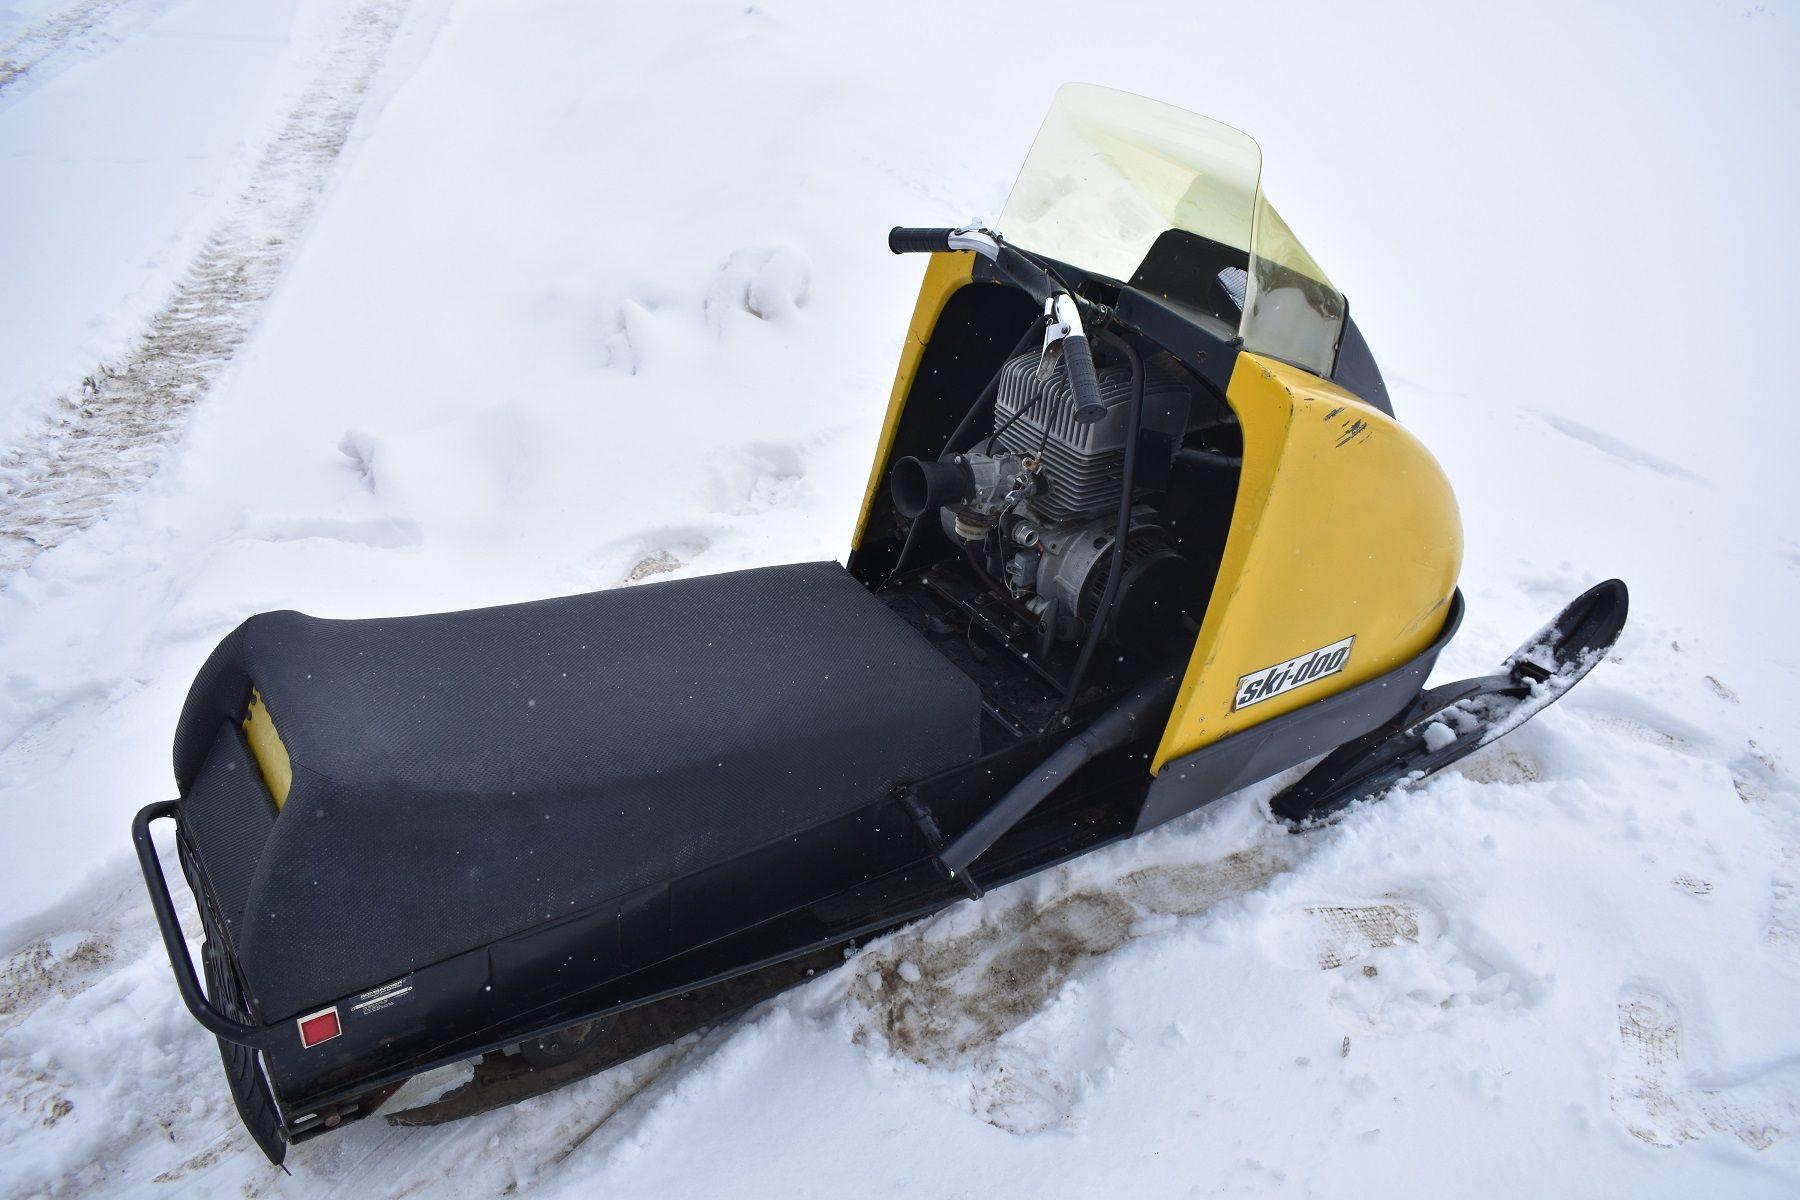 1971 Ski Doo Elan Blizzard Snowmobile Skiing Old Tractors